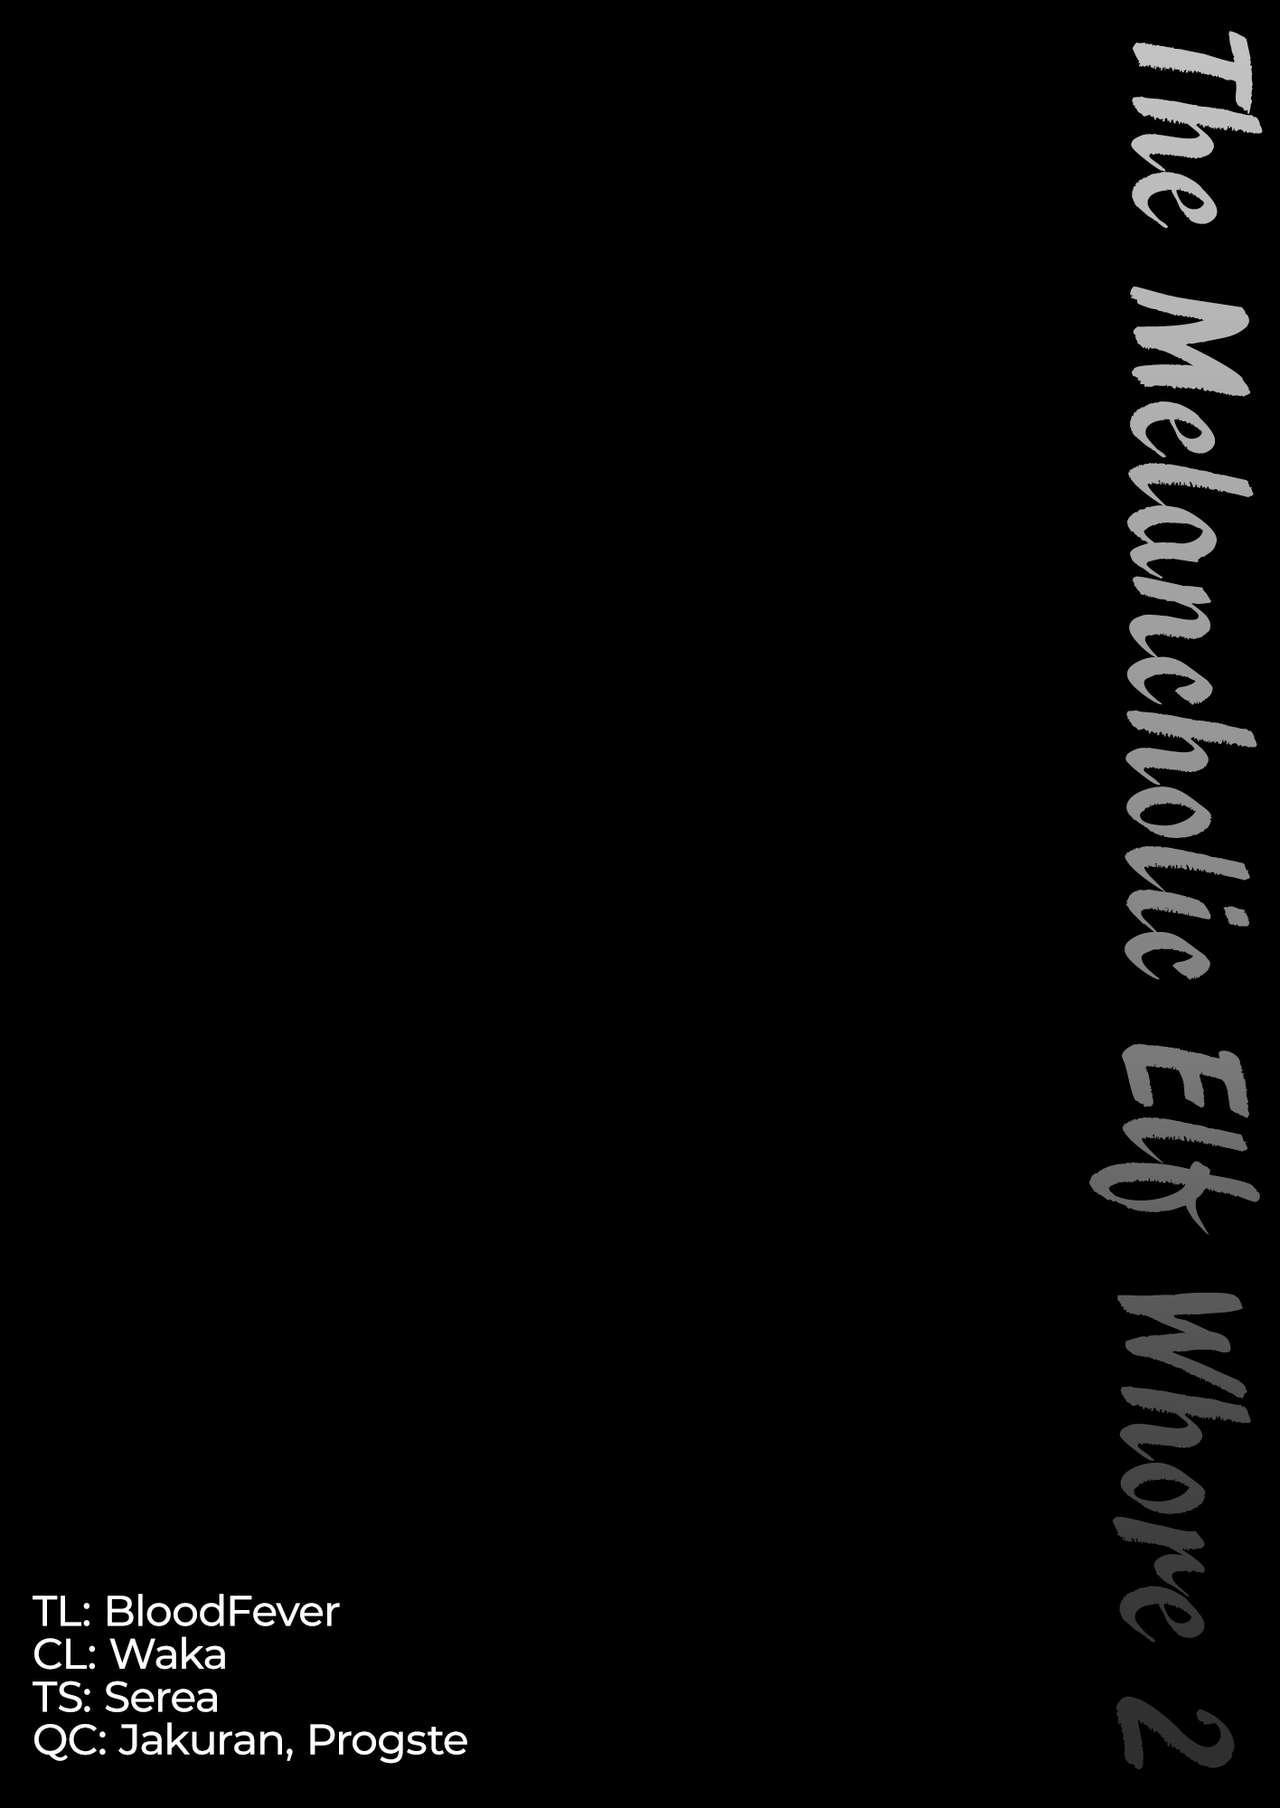 Tasogare no Shou Elf 2 - The story of Emma's side | The Melancholic Elf Whore 2 1